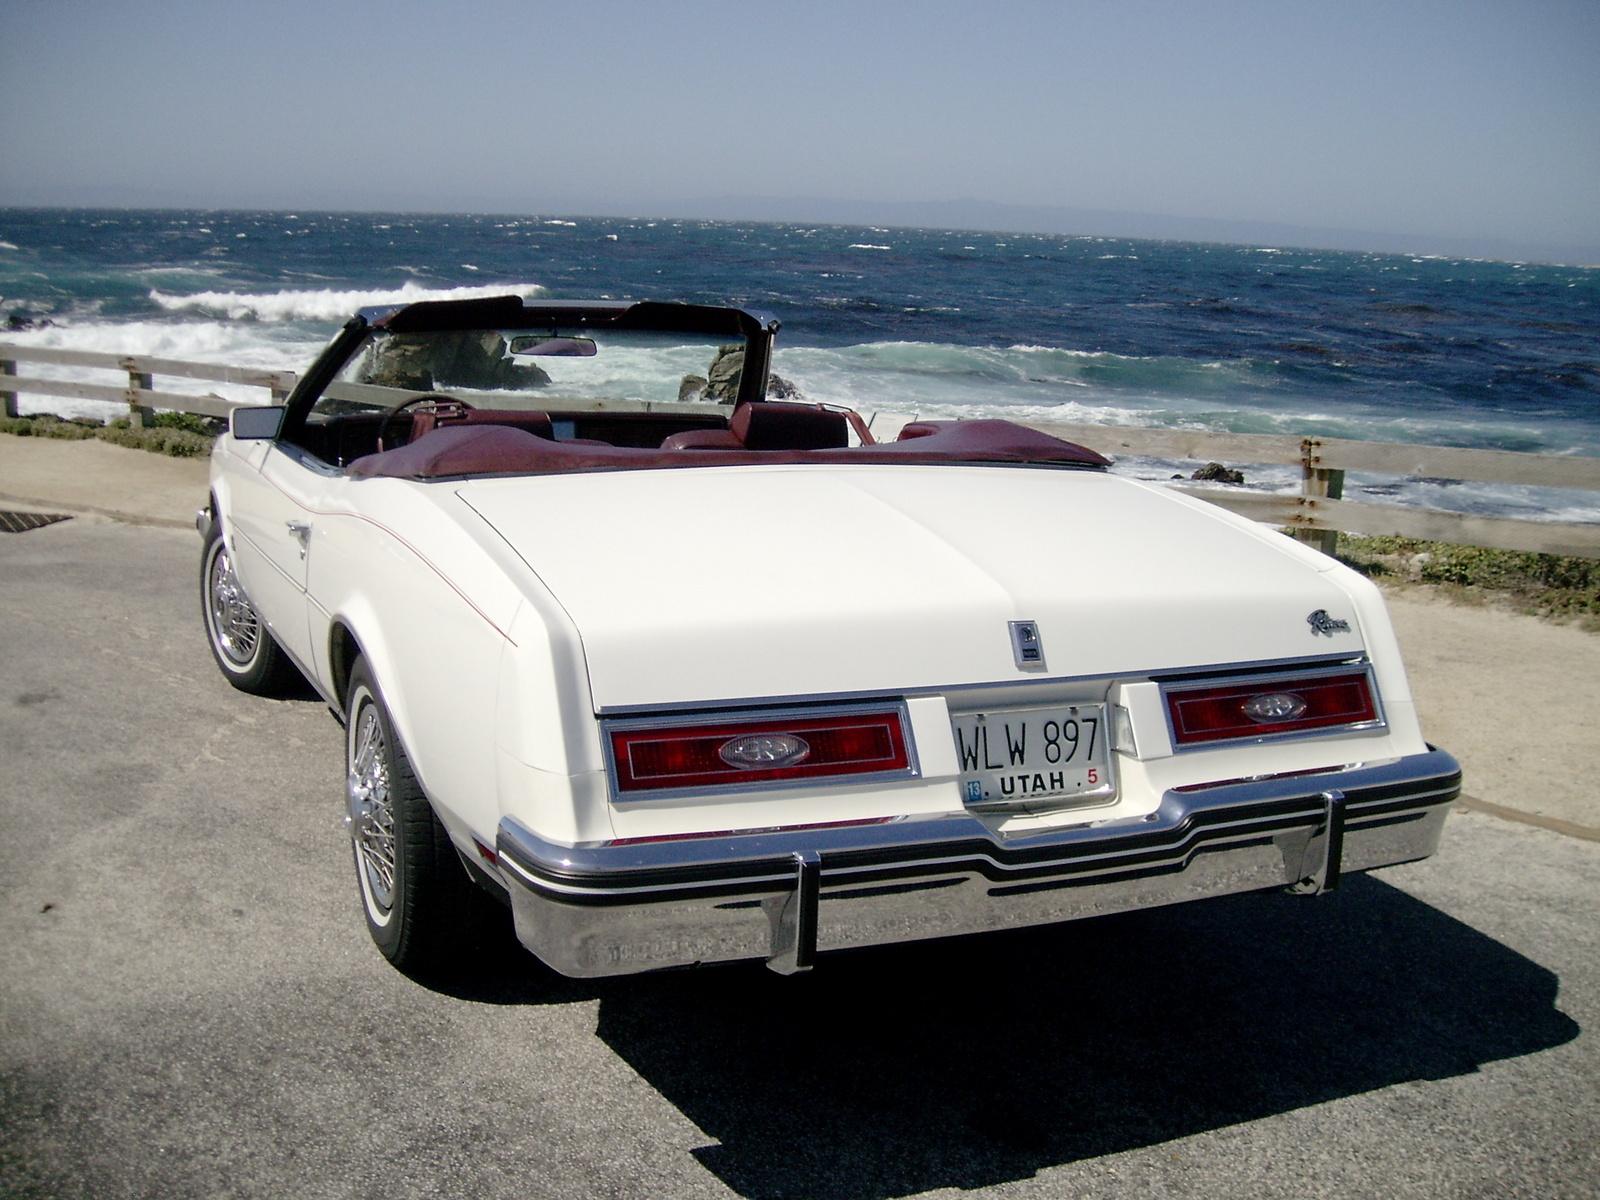 Used 1970 Buick Riviera Parts For Sale   Autos Weblog